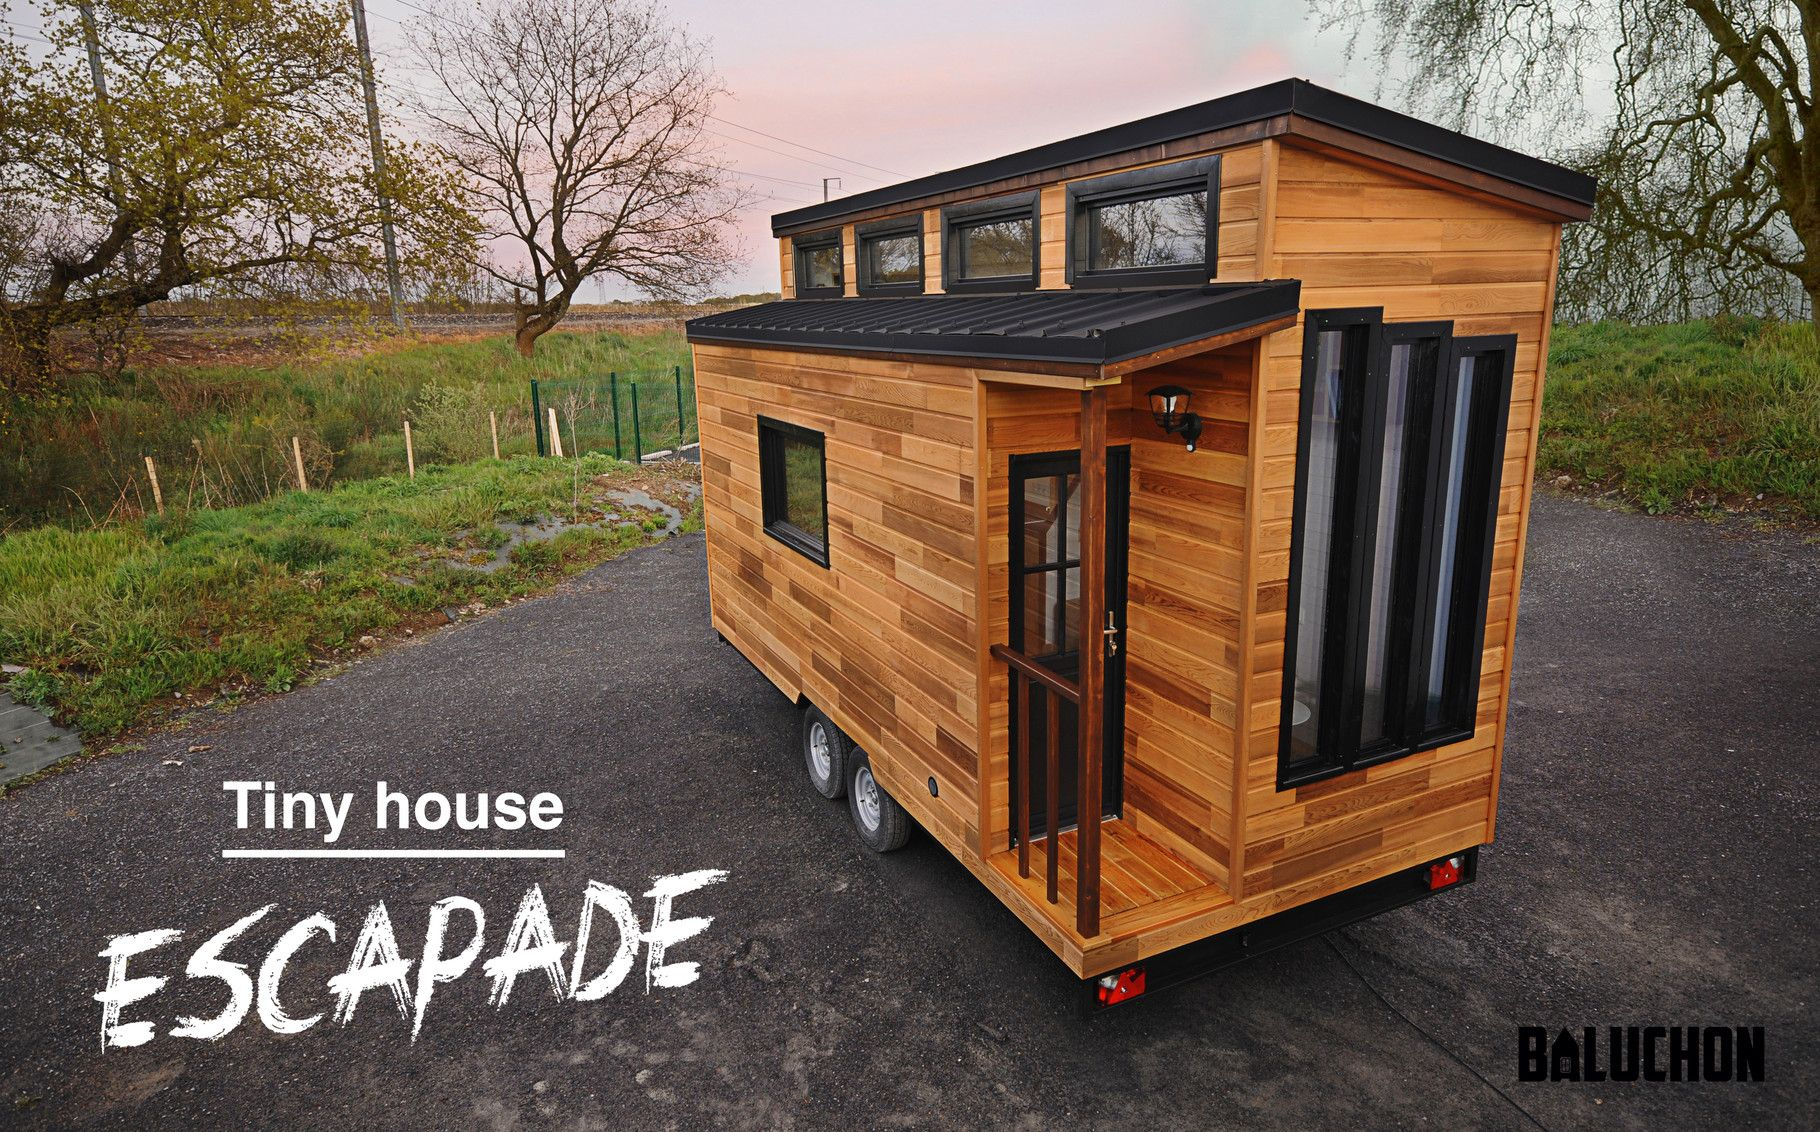 Achat Remorque Tiny House la tiny house escapade - site de tinyhouse-baluchon